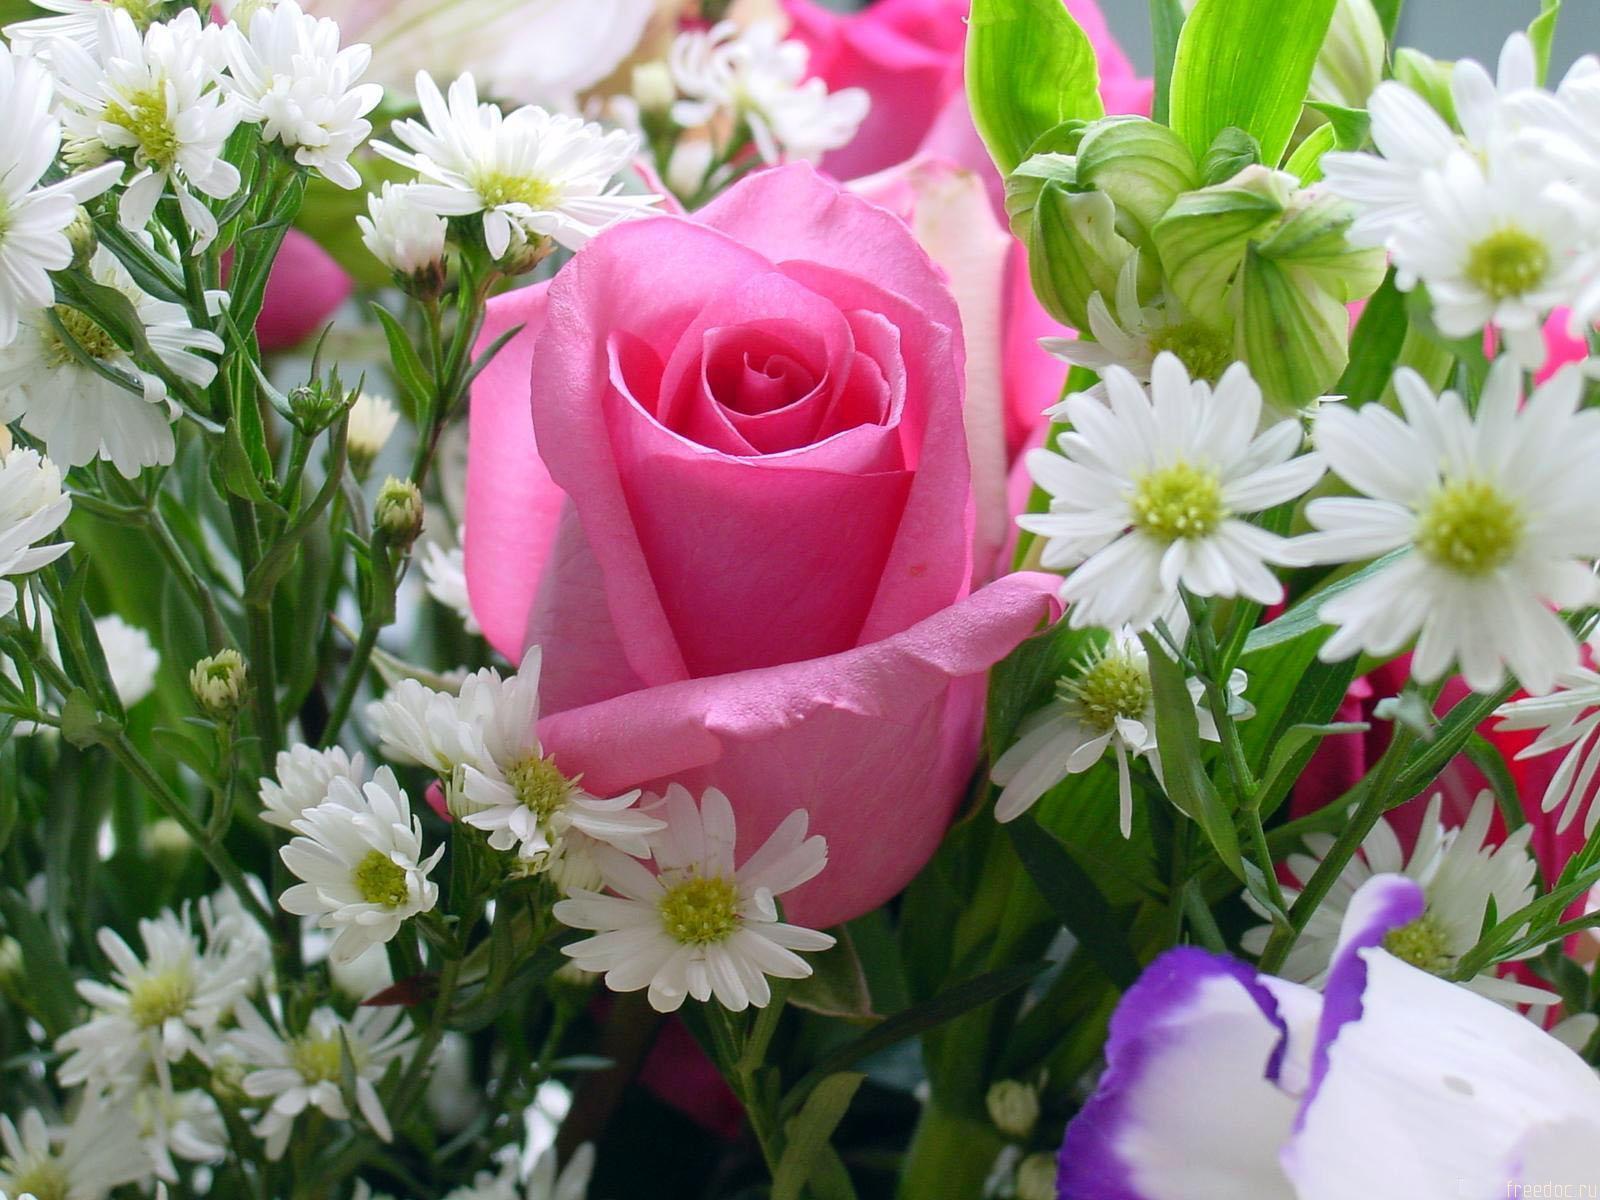 http://4.bp.blogspot.com/-DmSJzxTiMnk/TVTTXlbbsqI/AAAAAAAAAFc/0s2sVbZNjjE/s1600/pink_rose-normal.jpg